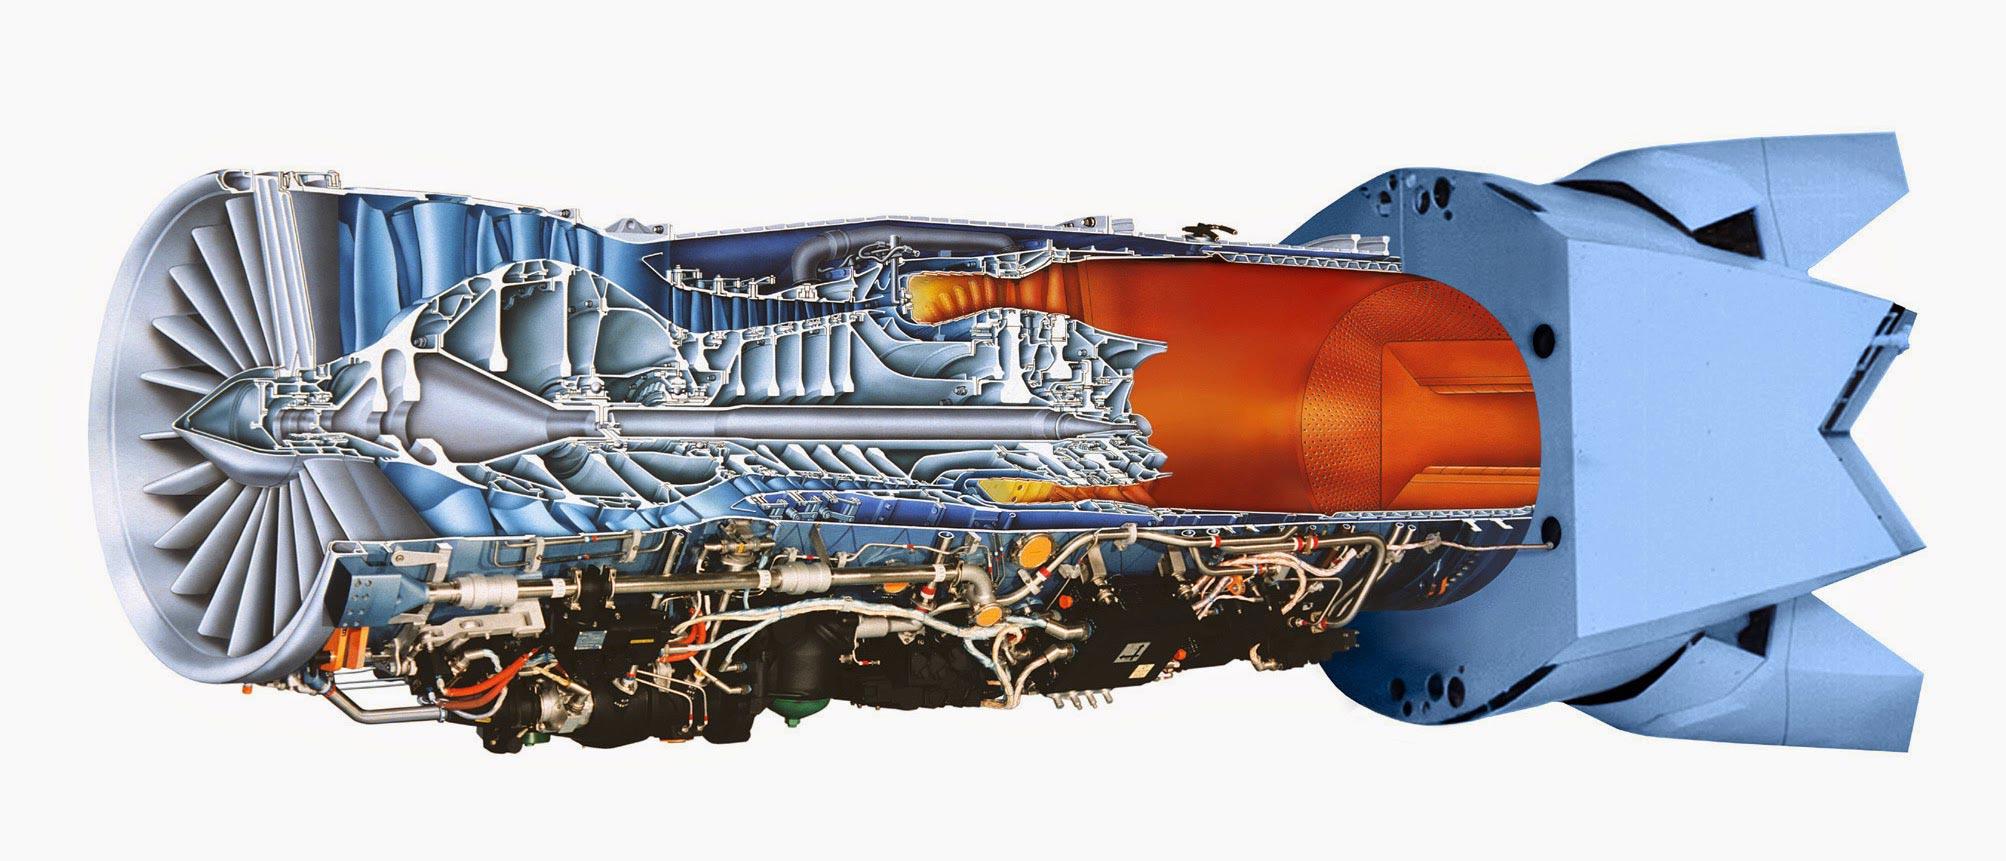 Pratt & Whitney F119 cutaway drawing